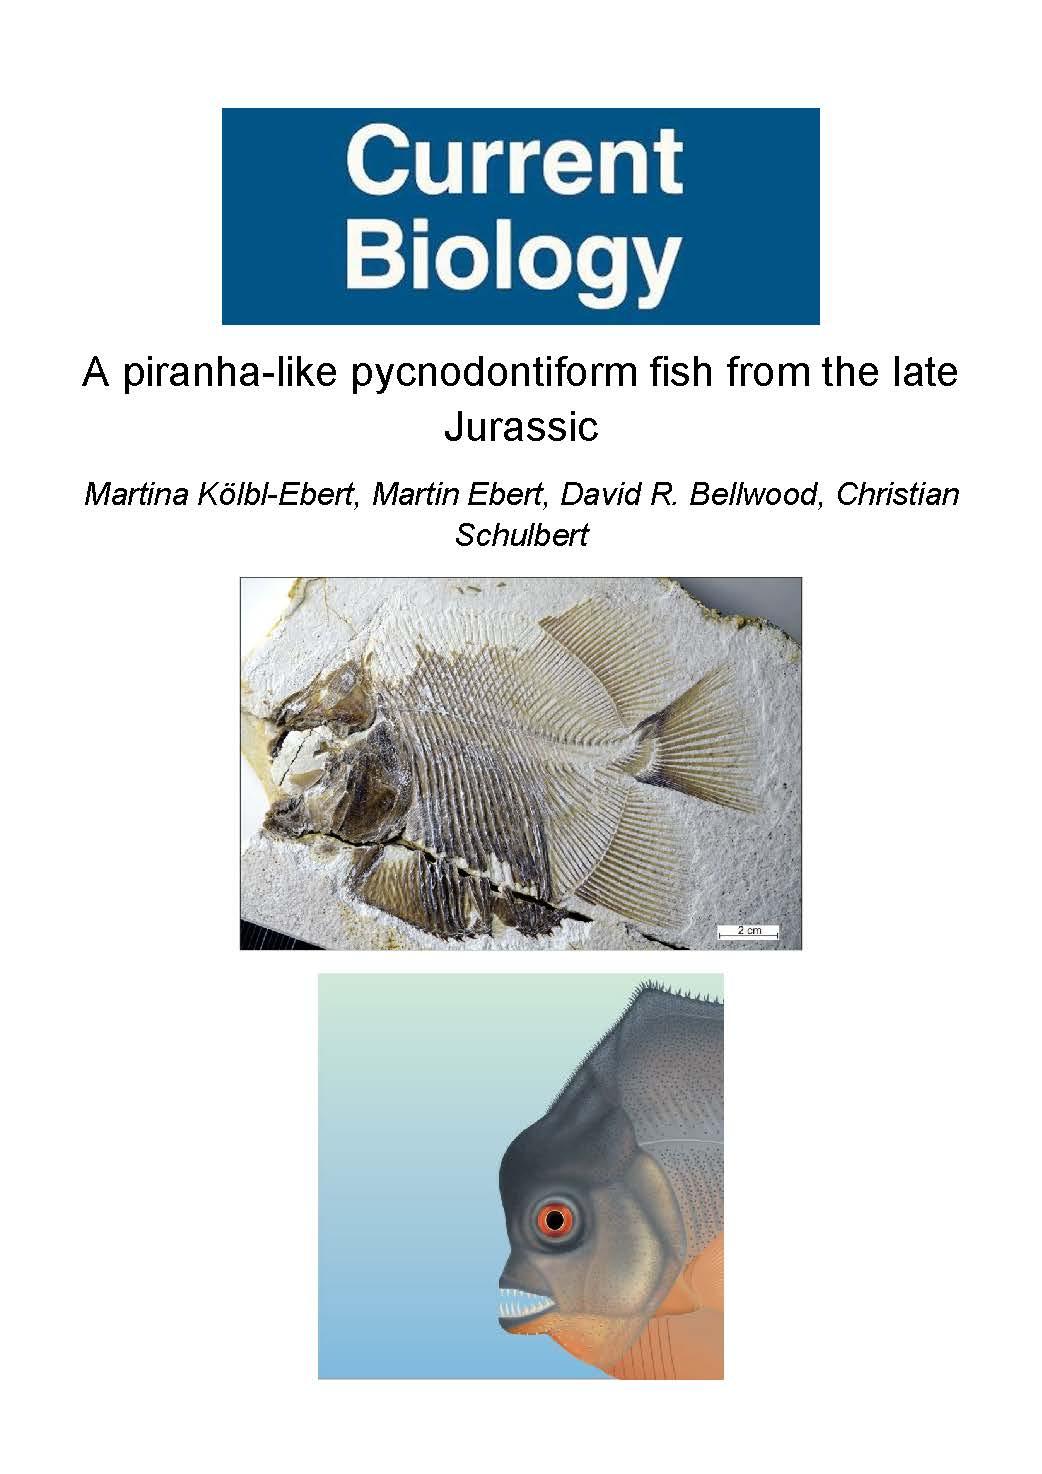 Kolbl-Ebert et al. 2018 (Current Biology).jpg